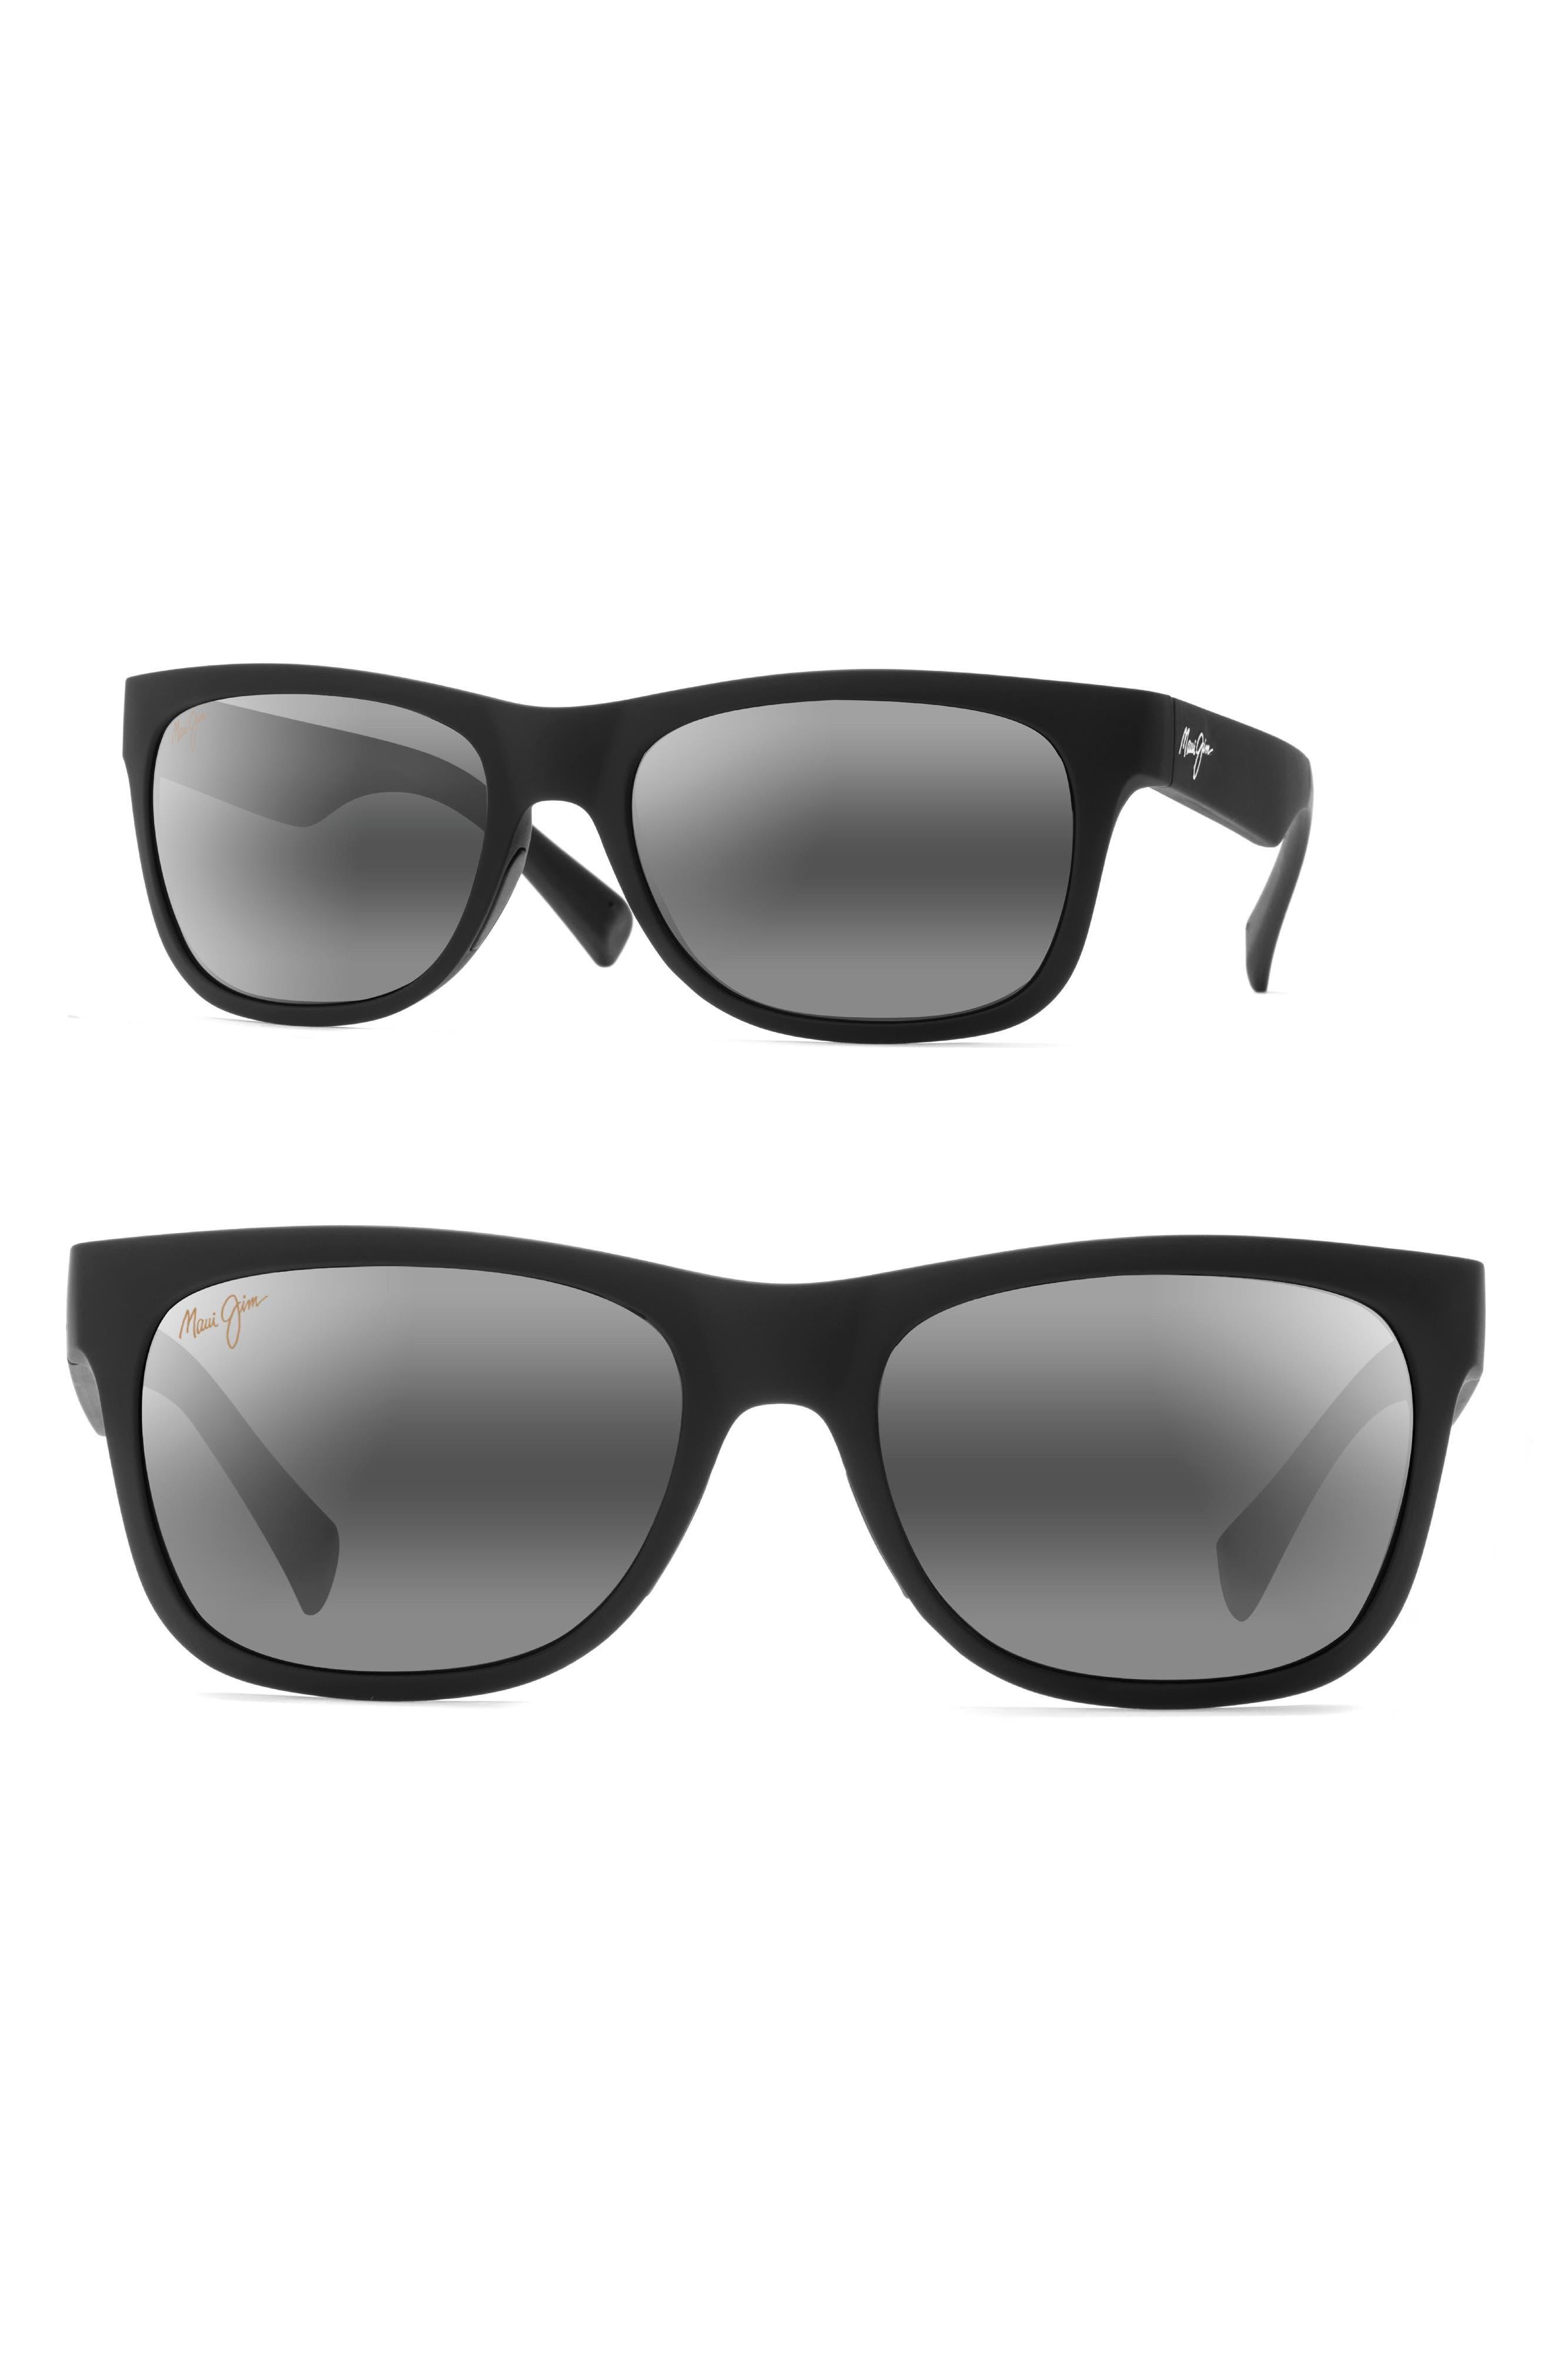 Kahi 58mm Polarizedplus2 Sunglasses